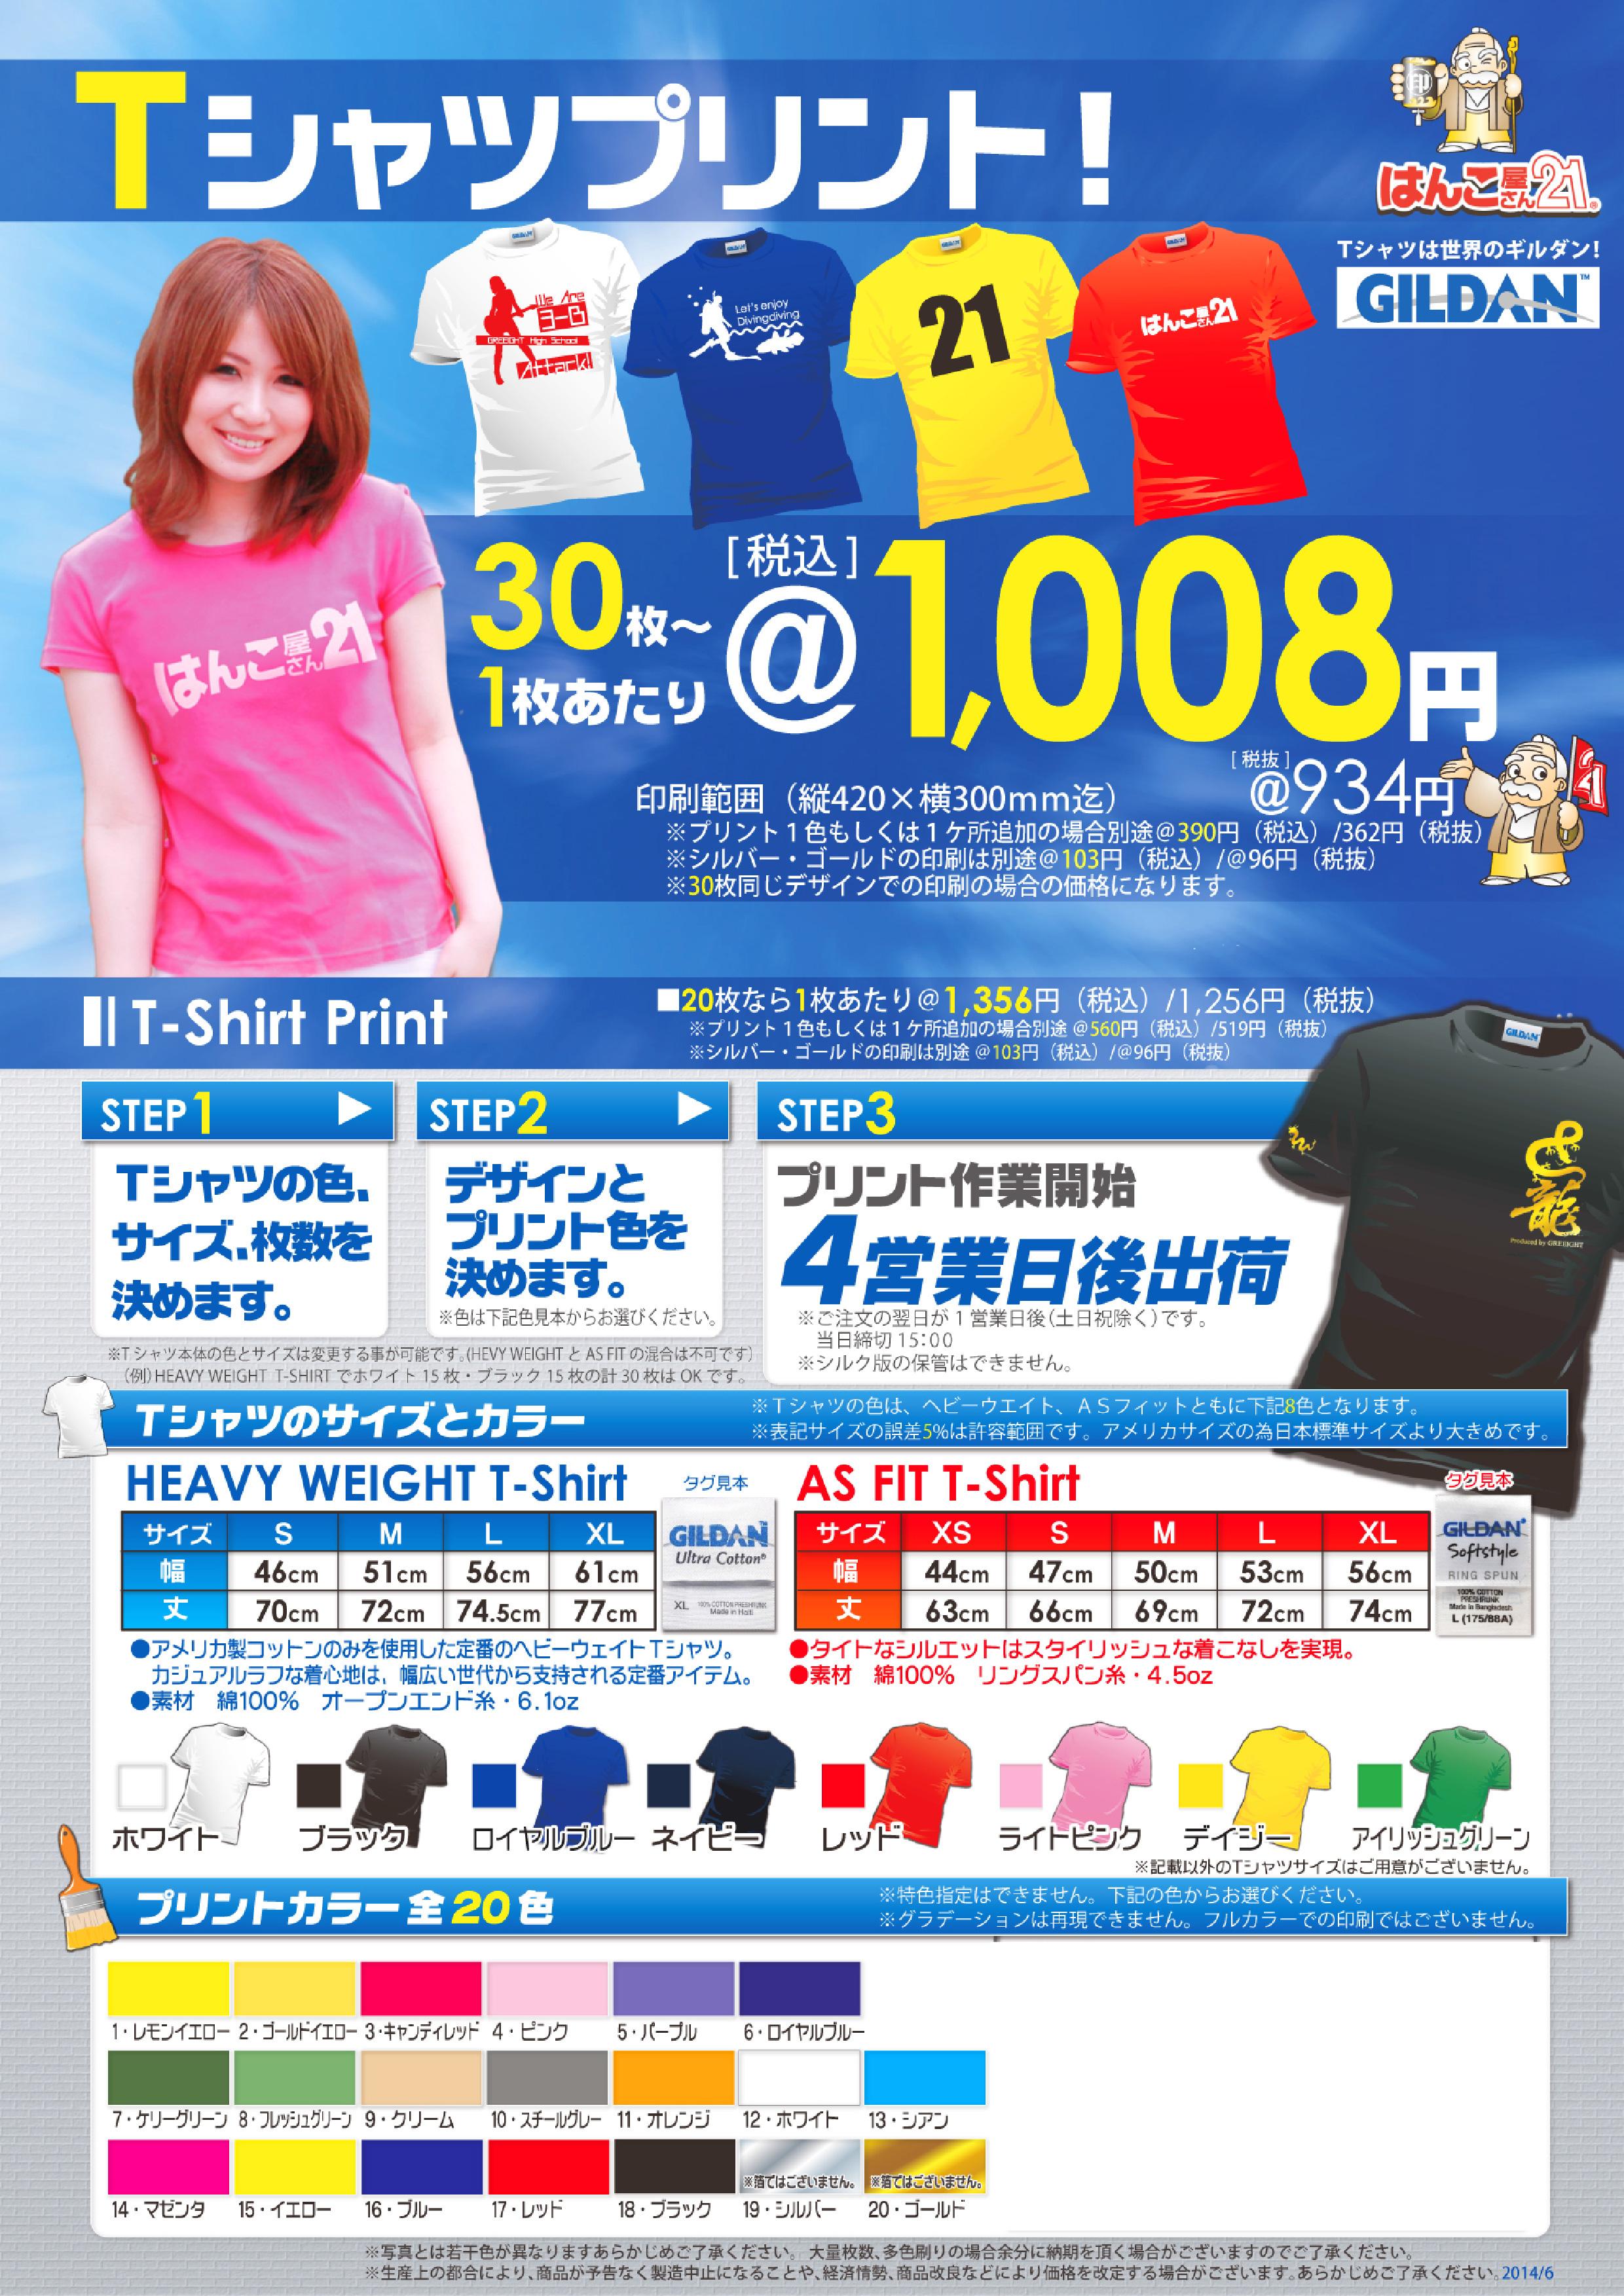 1008円